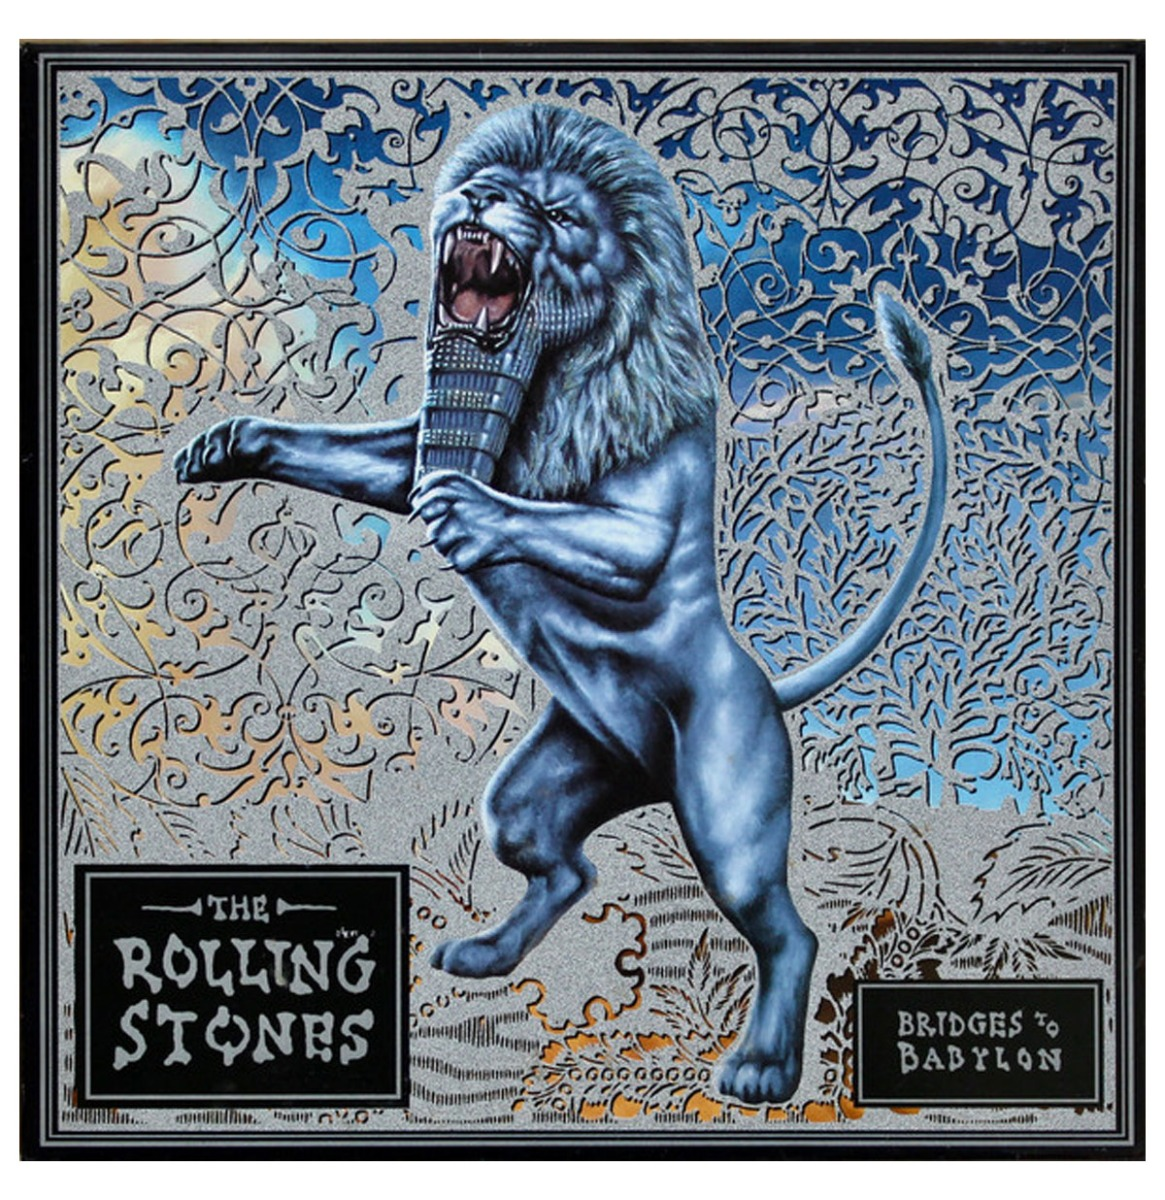 The Rolling Stones - Bridges To Babylon 2-LP